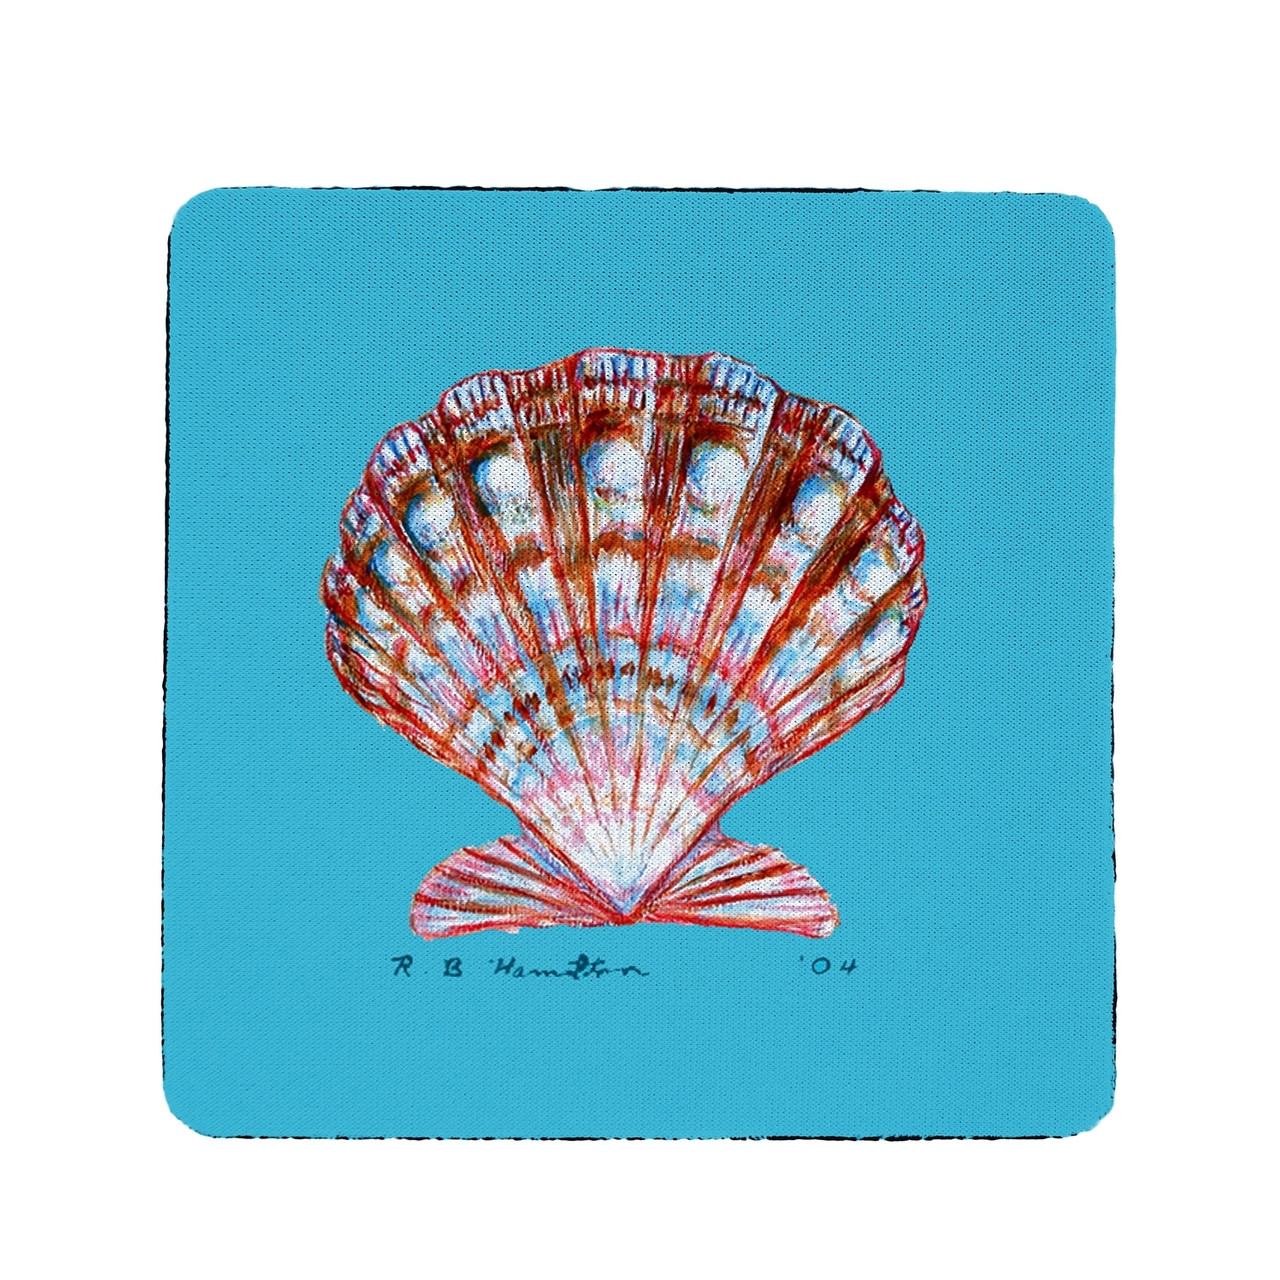 Scallop Coasters - Set of 4